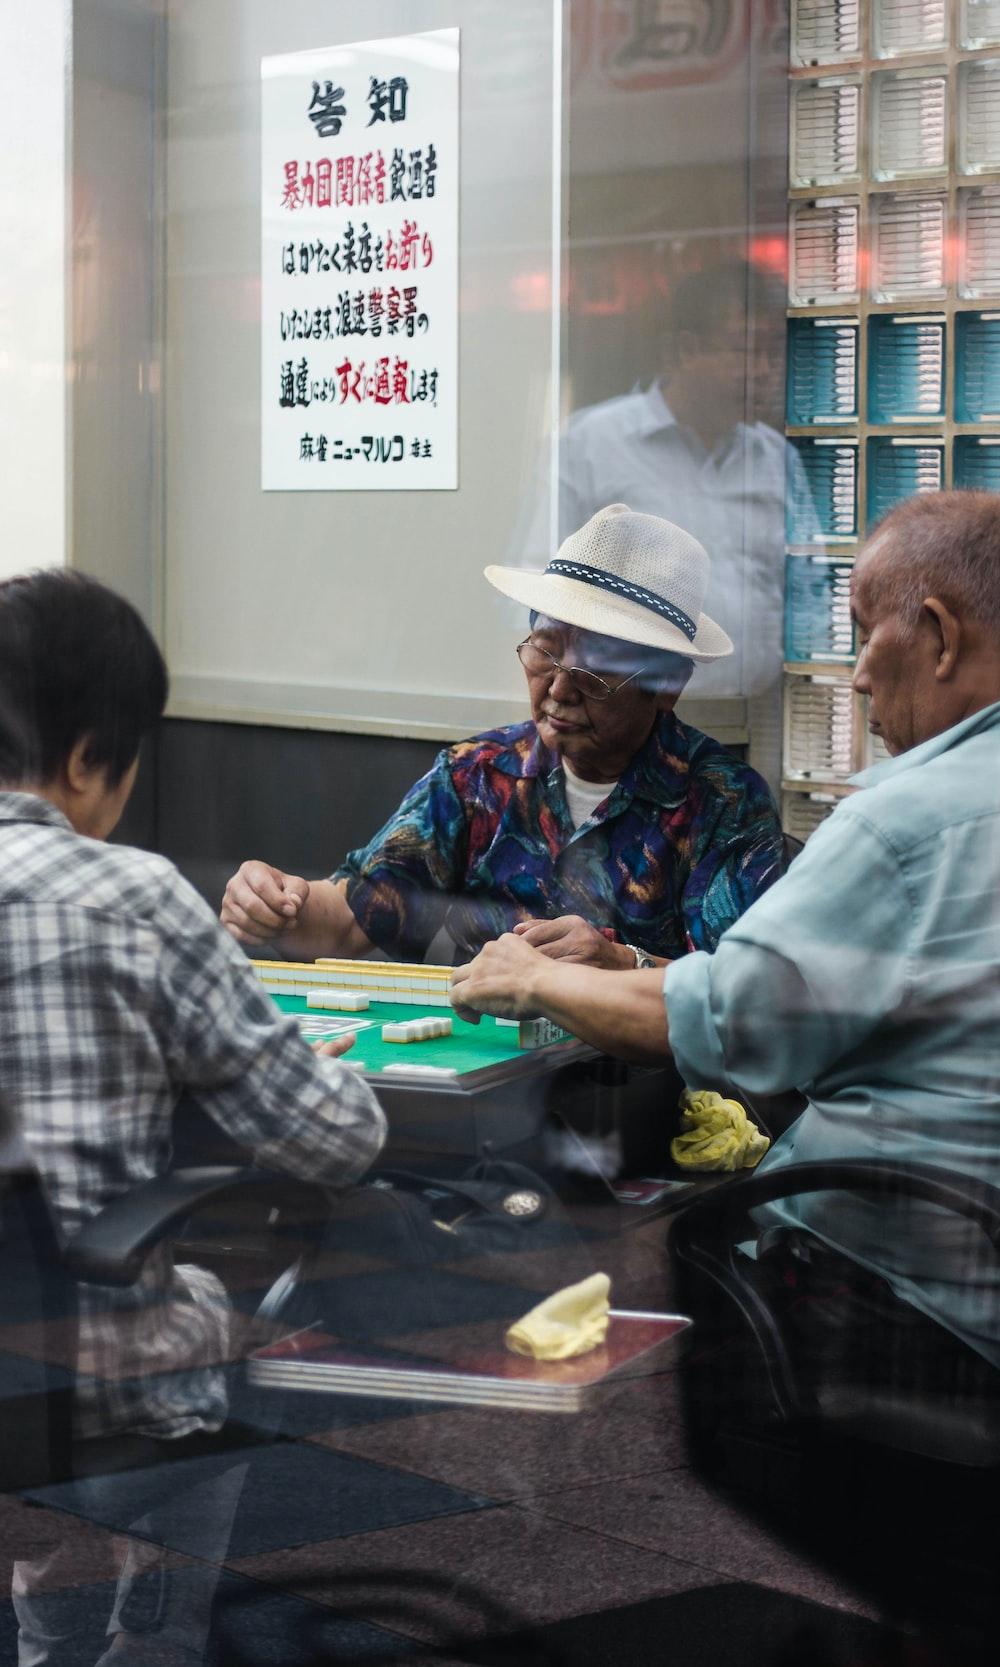 three man sitting playing mahjong inside room